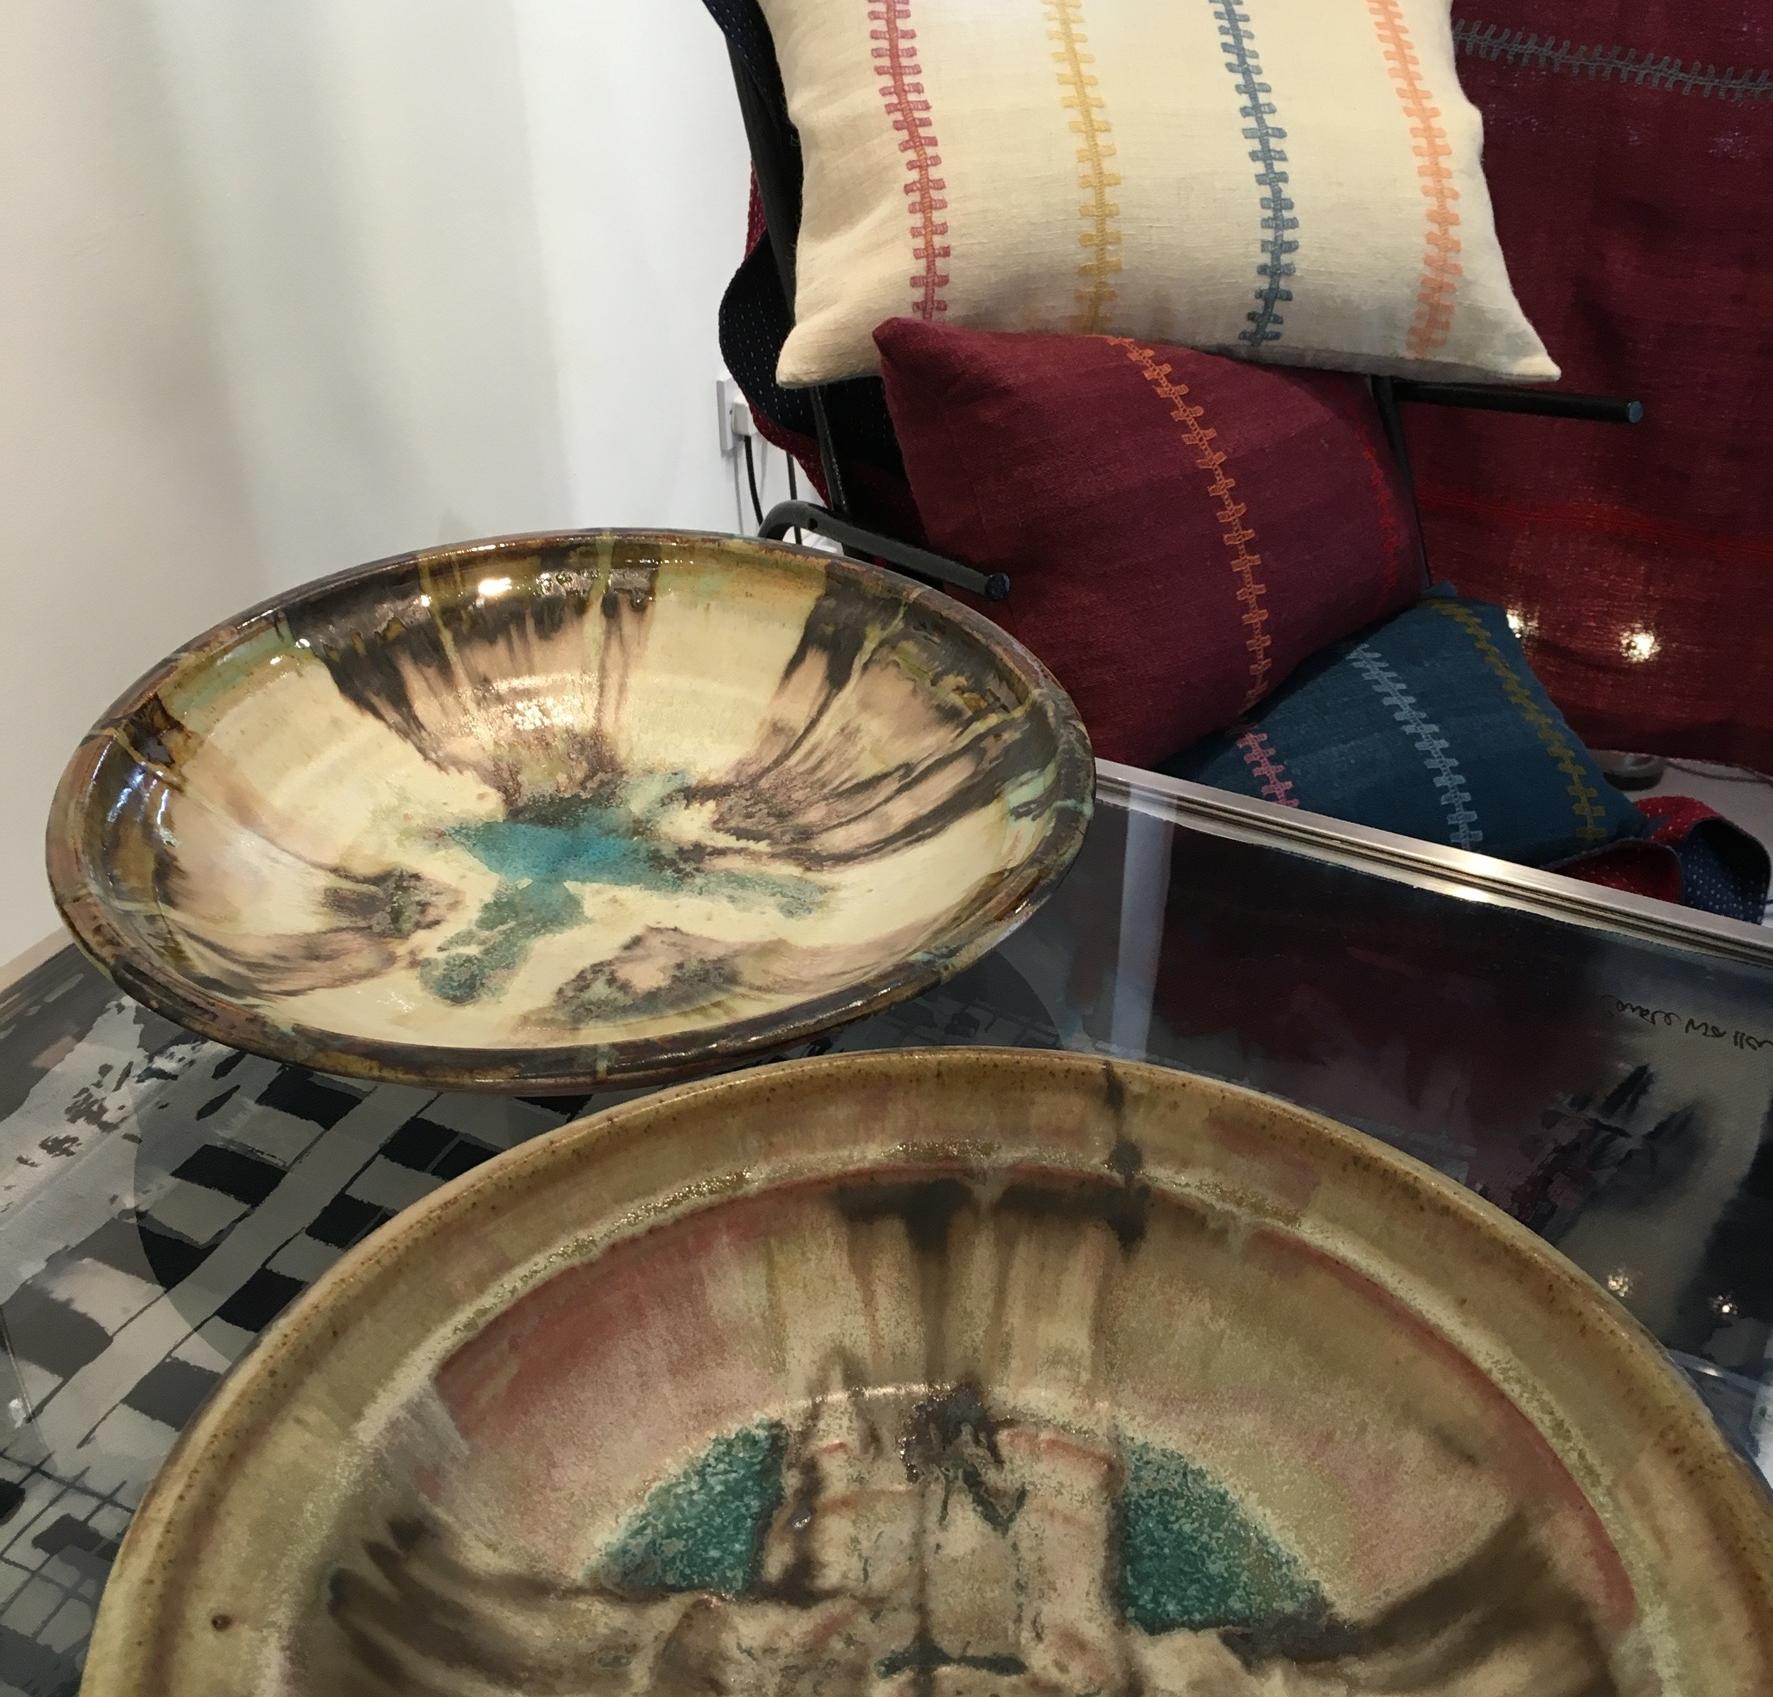 Gary Wood large bowls, Stitch by Stitch Desi wool cushions